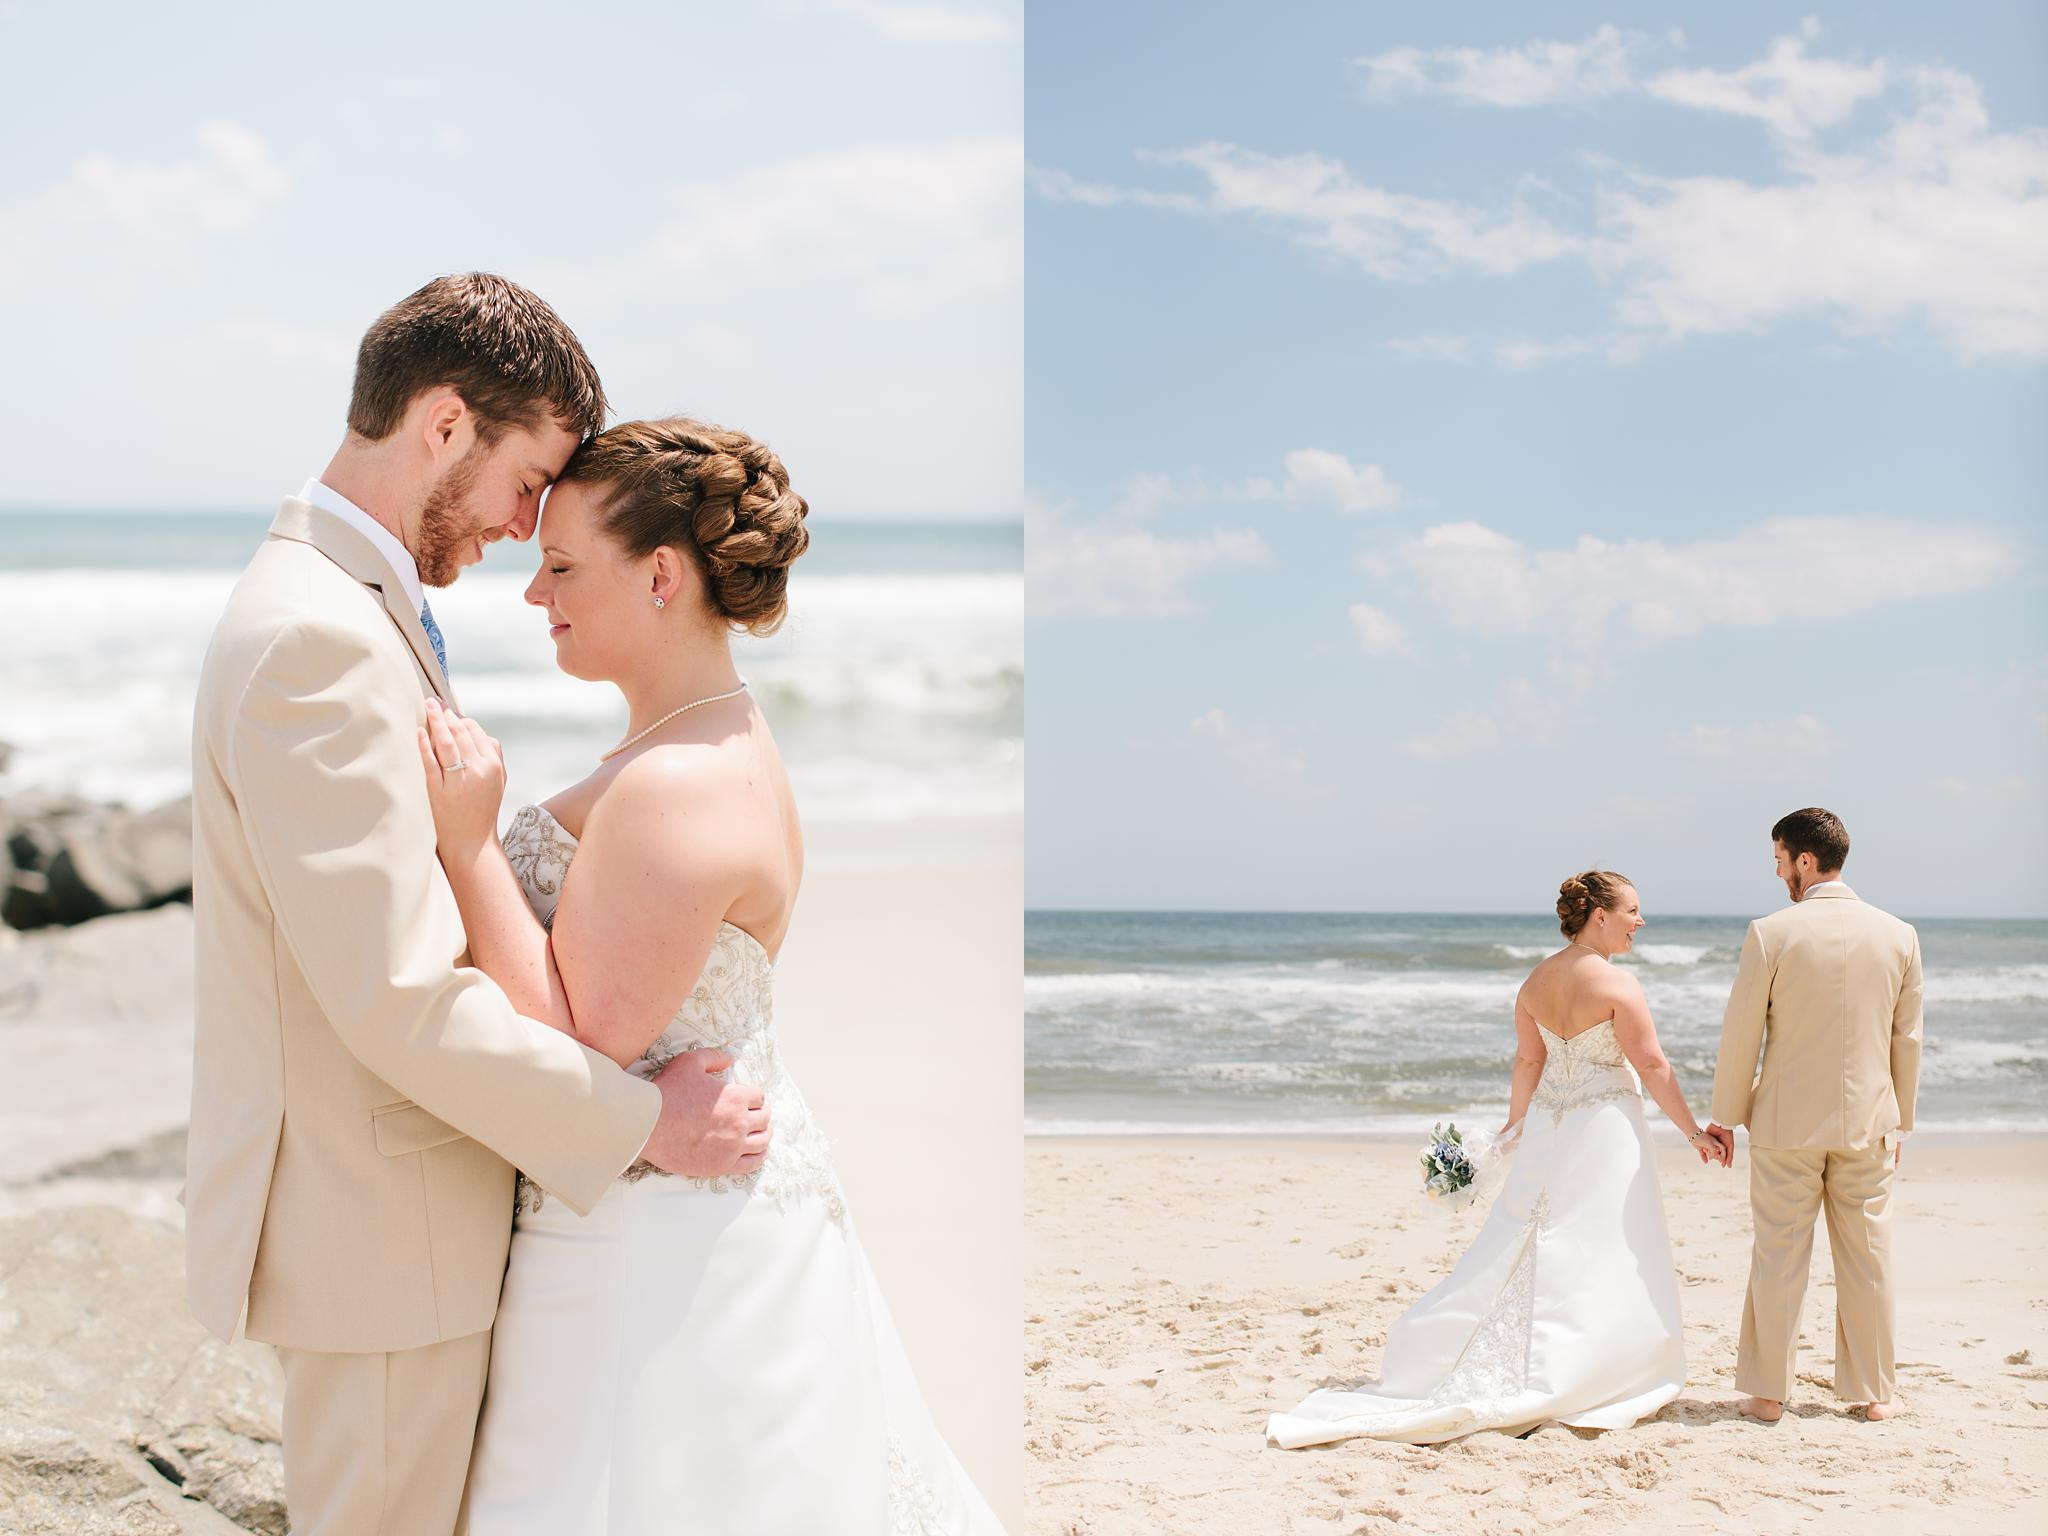 brant_beach_yacht_club_wedding_long_beach_island_nj_wedding_photographer_122.jpg